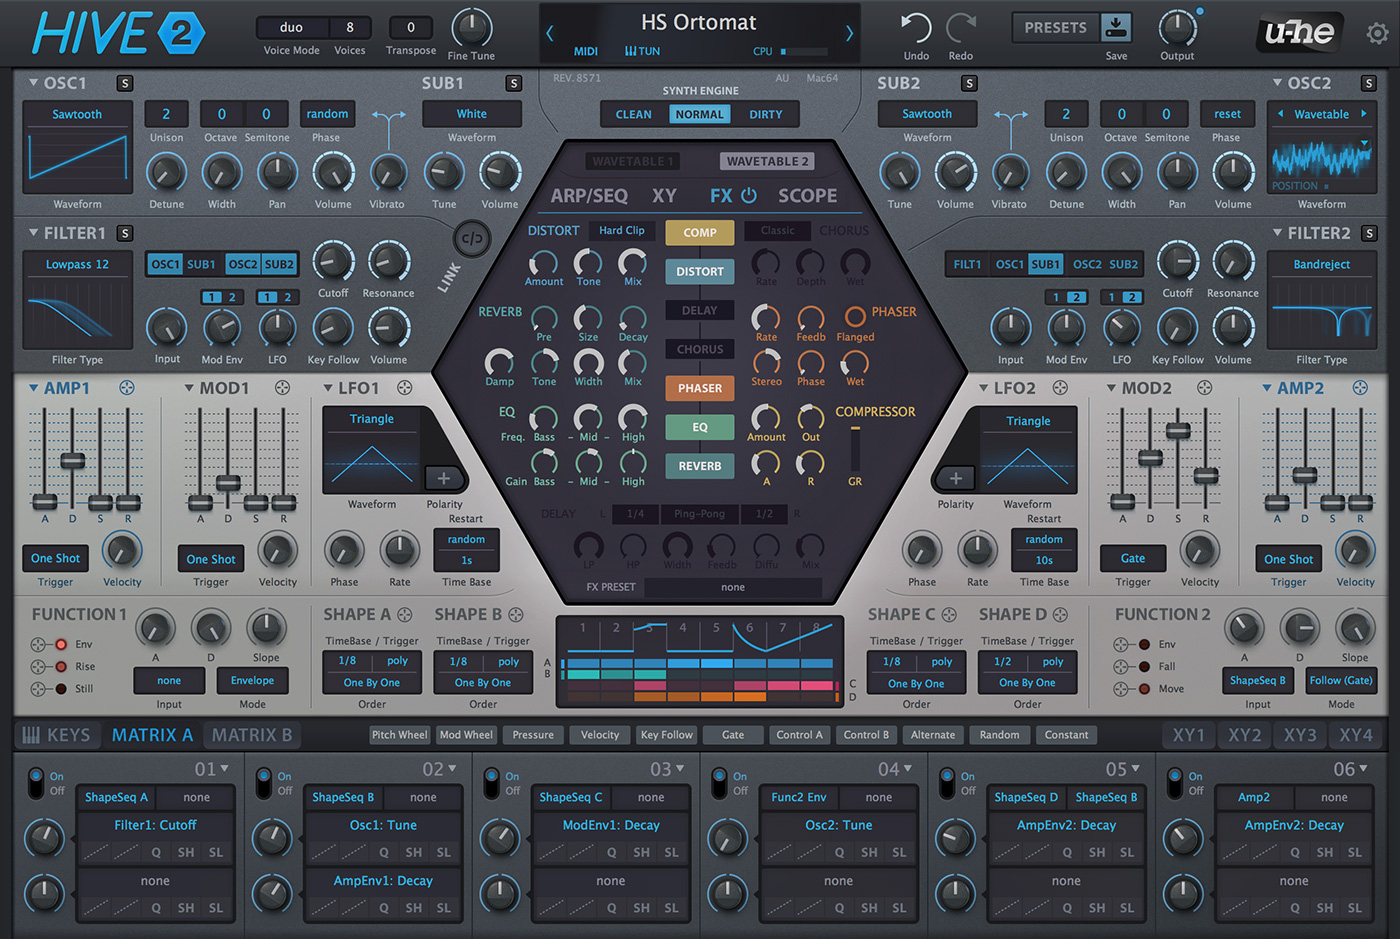 KVR: Hive 2 by u-he - Lead Synth VST Plugin, Audio Units Plugin, VST